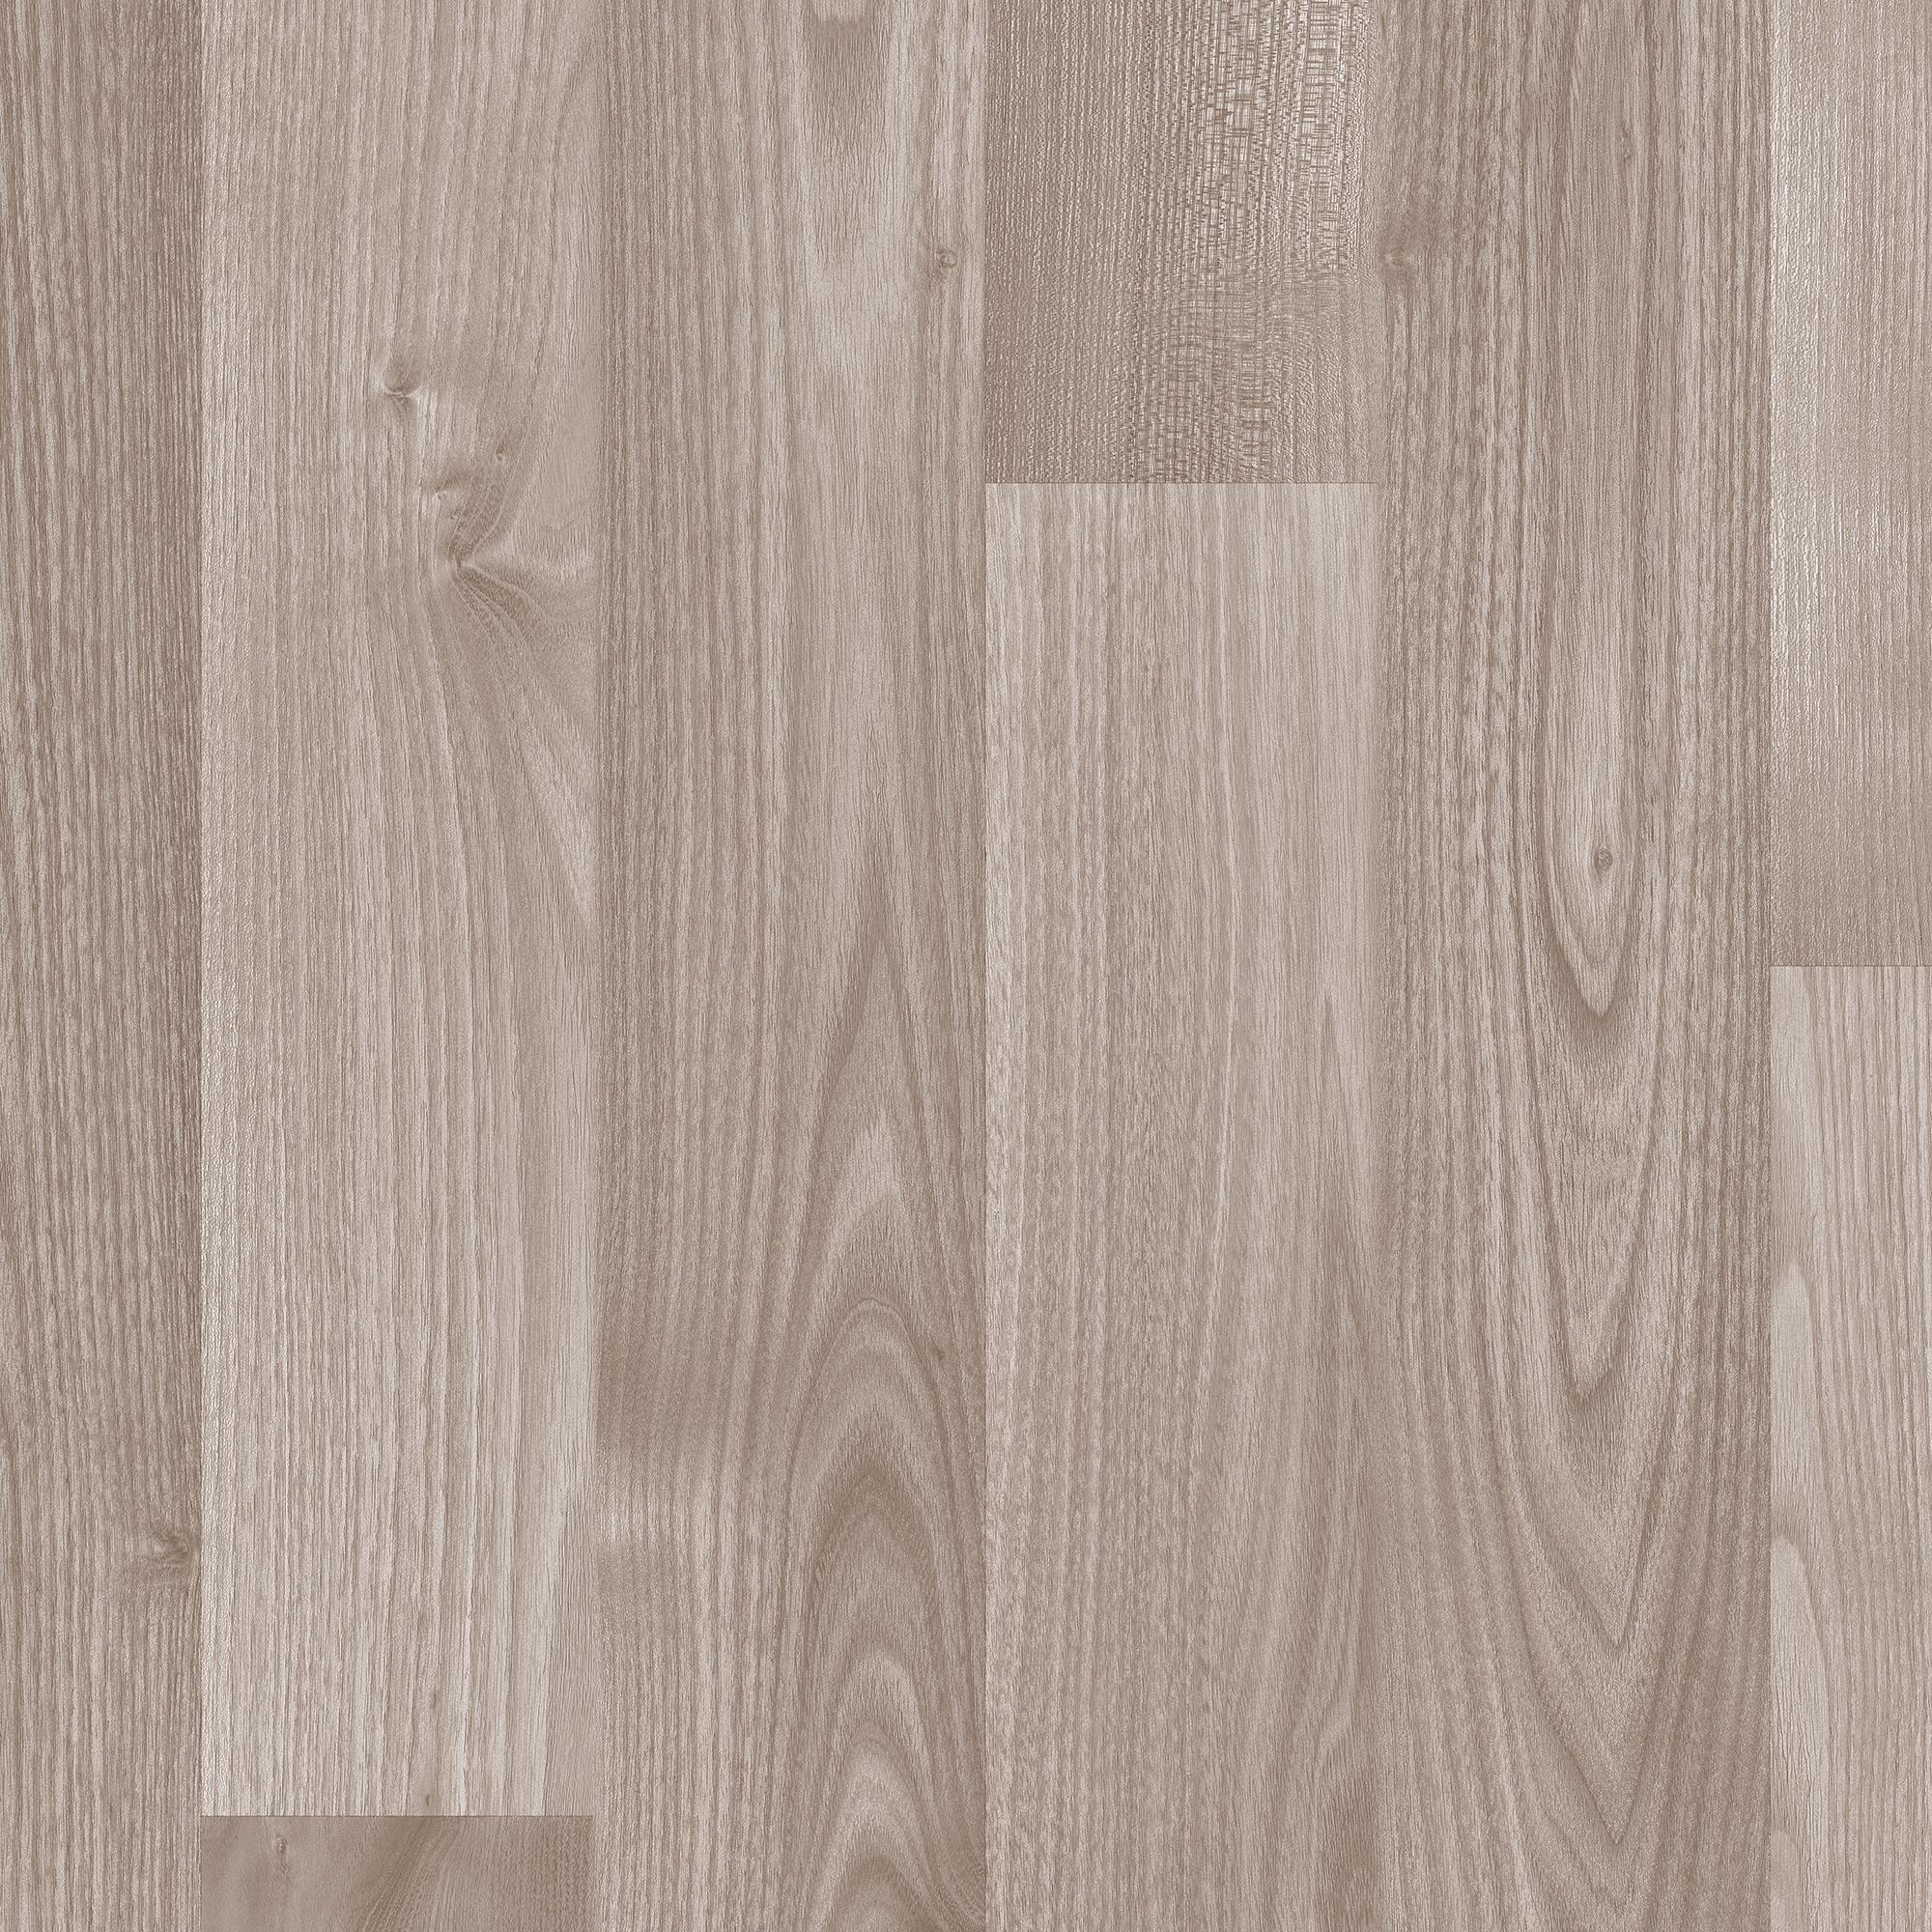 Laminatgolv BerryAlloc Original Lista Oak 2-Stav